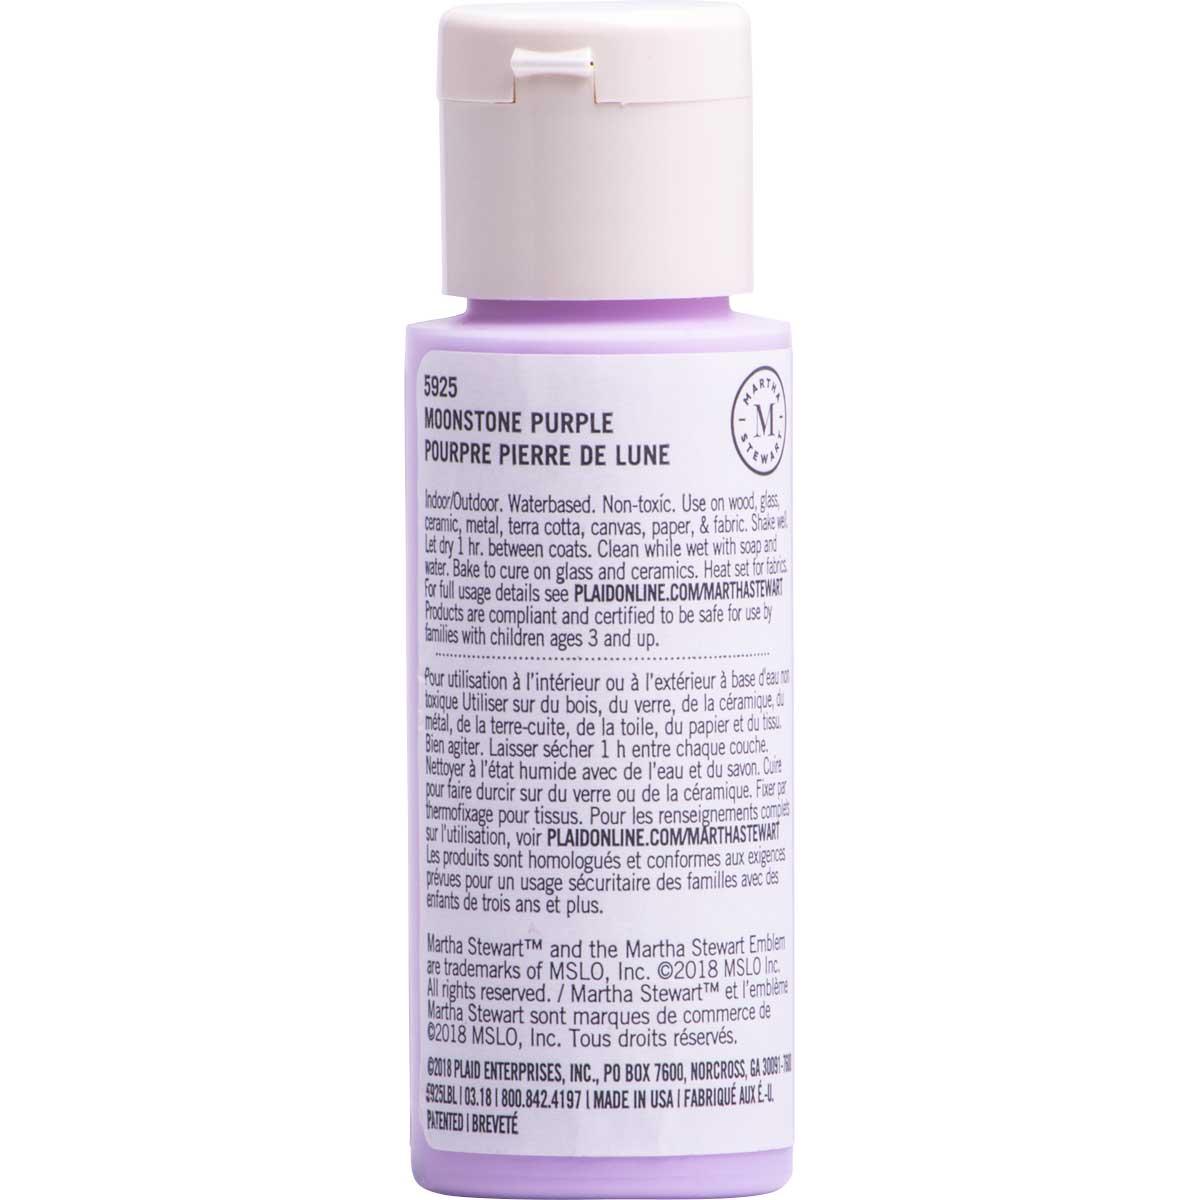 Martha Stewart ® Multi-Surface Satin Acrylic Craft Paint CPSIA - Moonstone Purple, 2 oz. - 5925